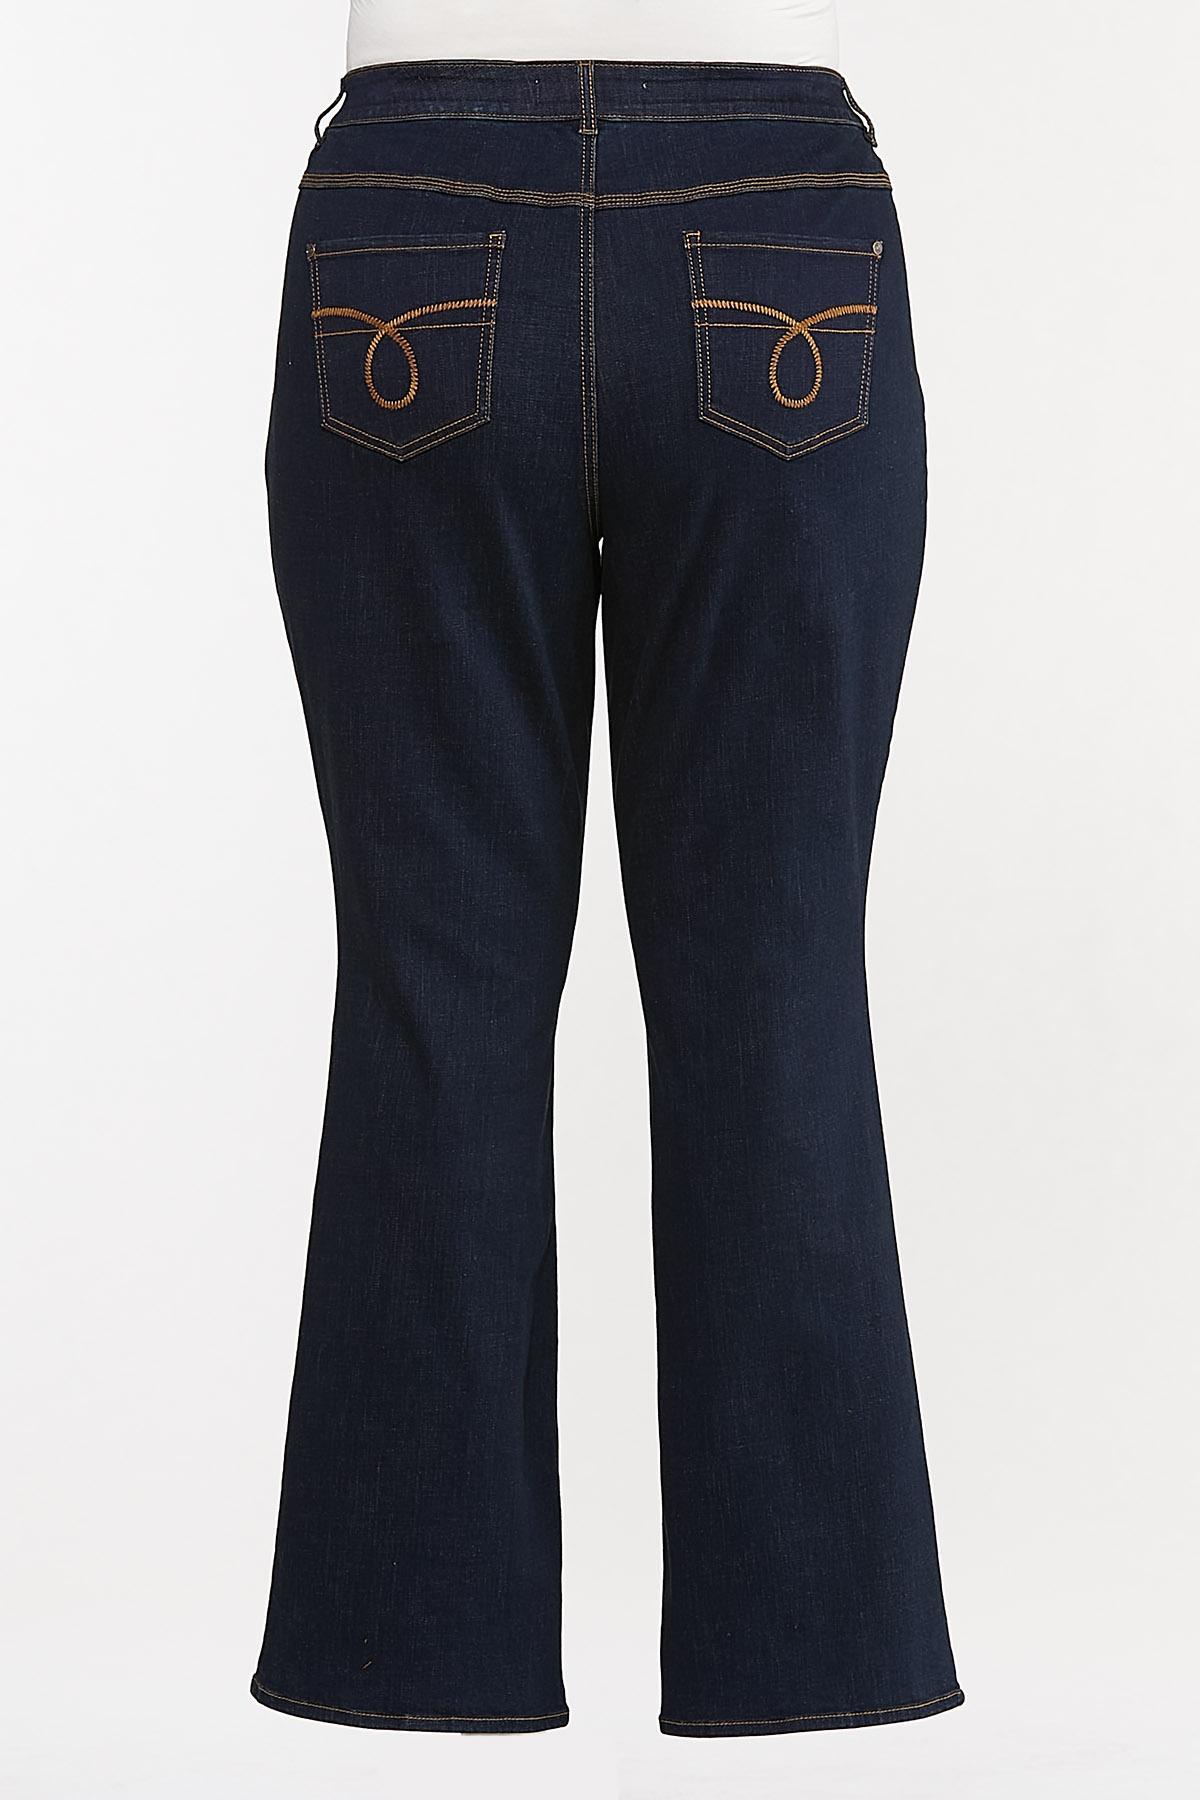 Plus Petite Dark Bootcut Jeans (Item #44664787)